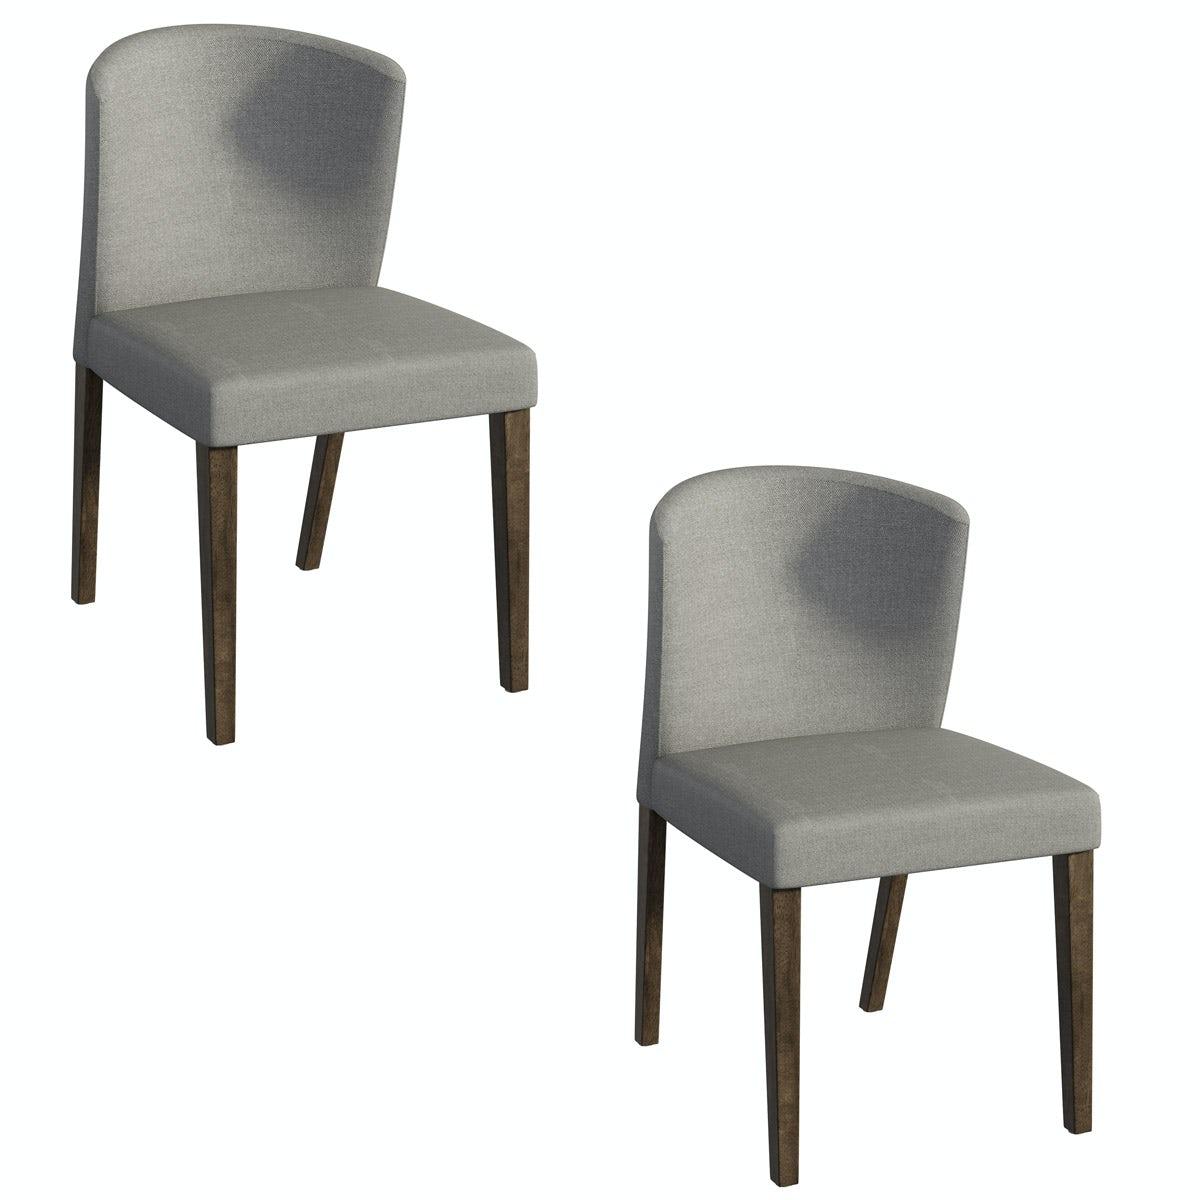 Hudson Walnut and Dark Grey Pair of Dining Chairs